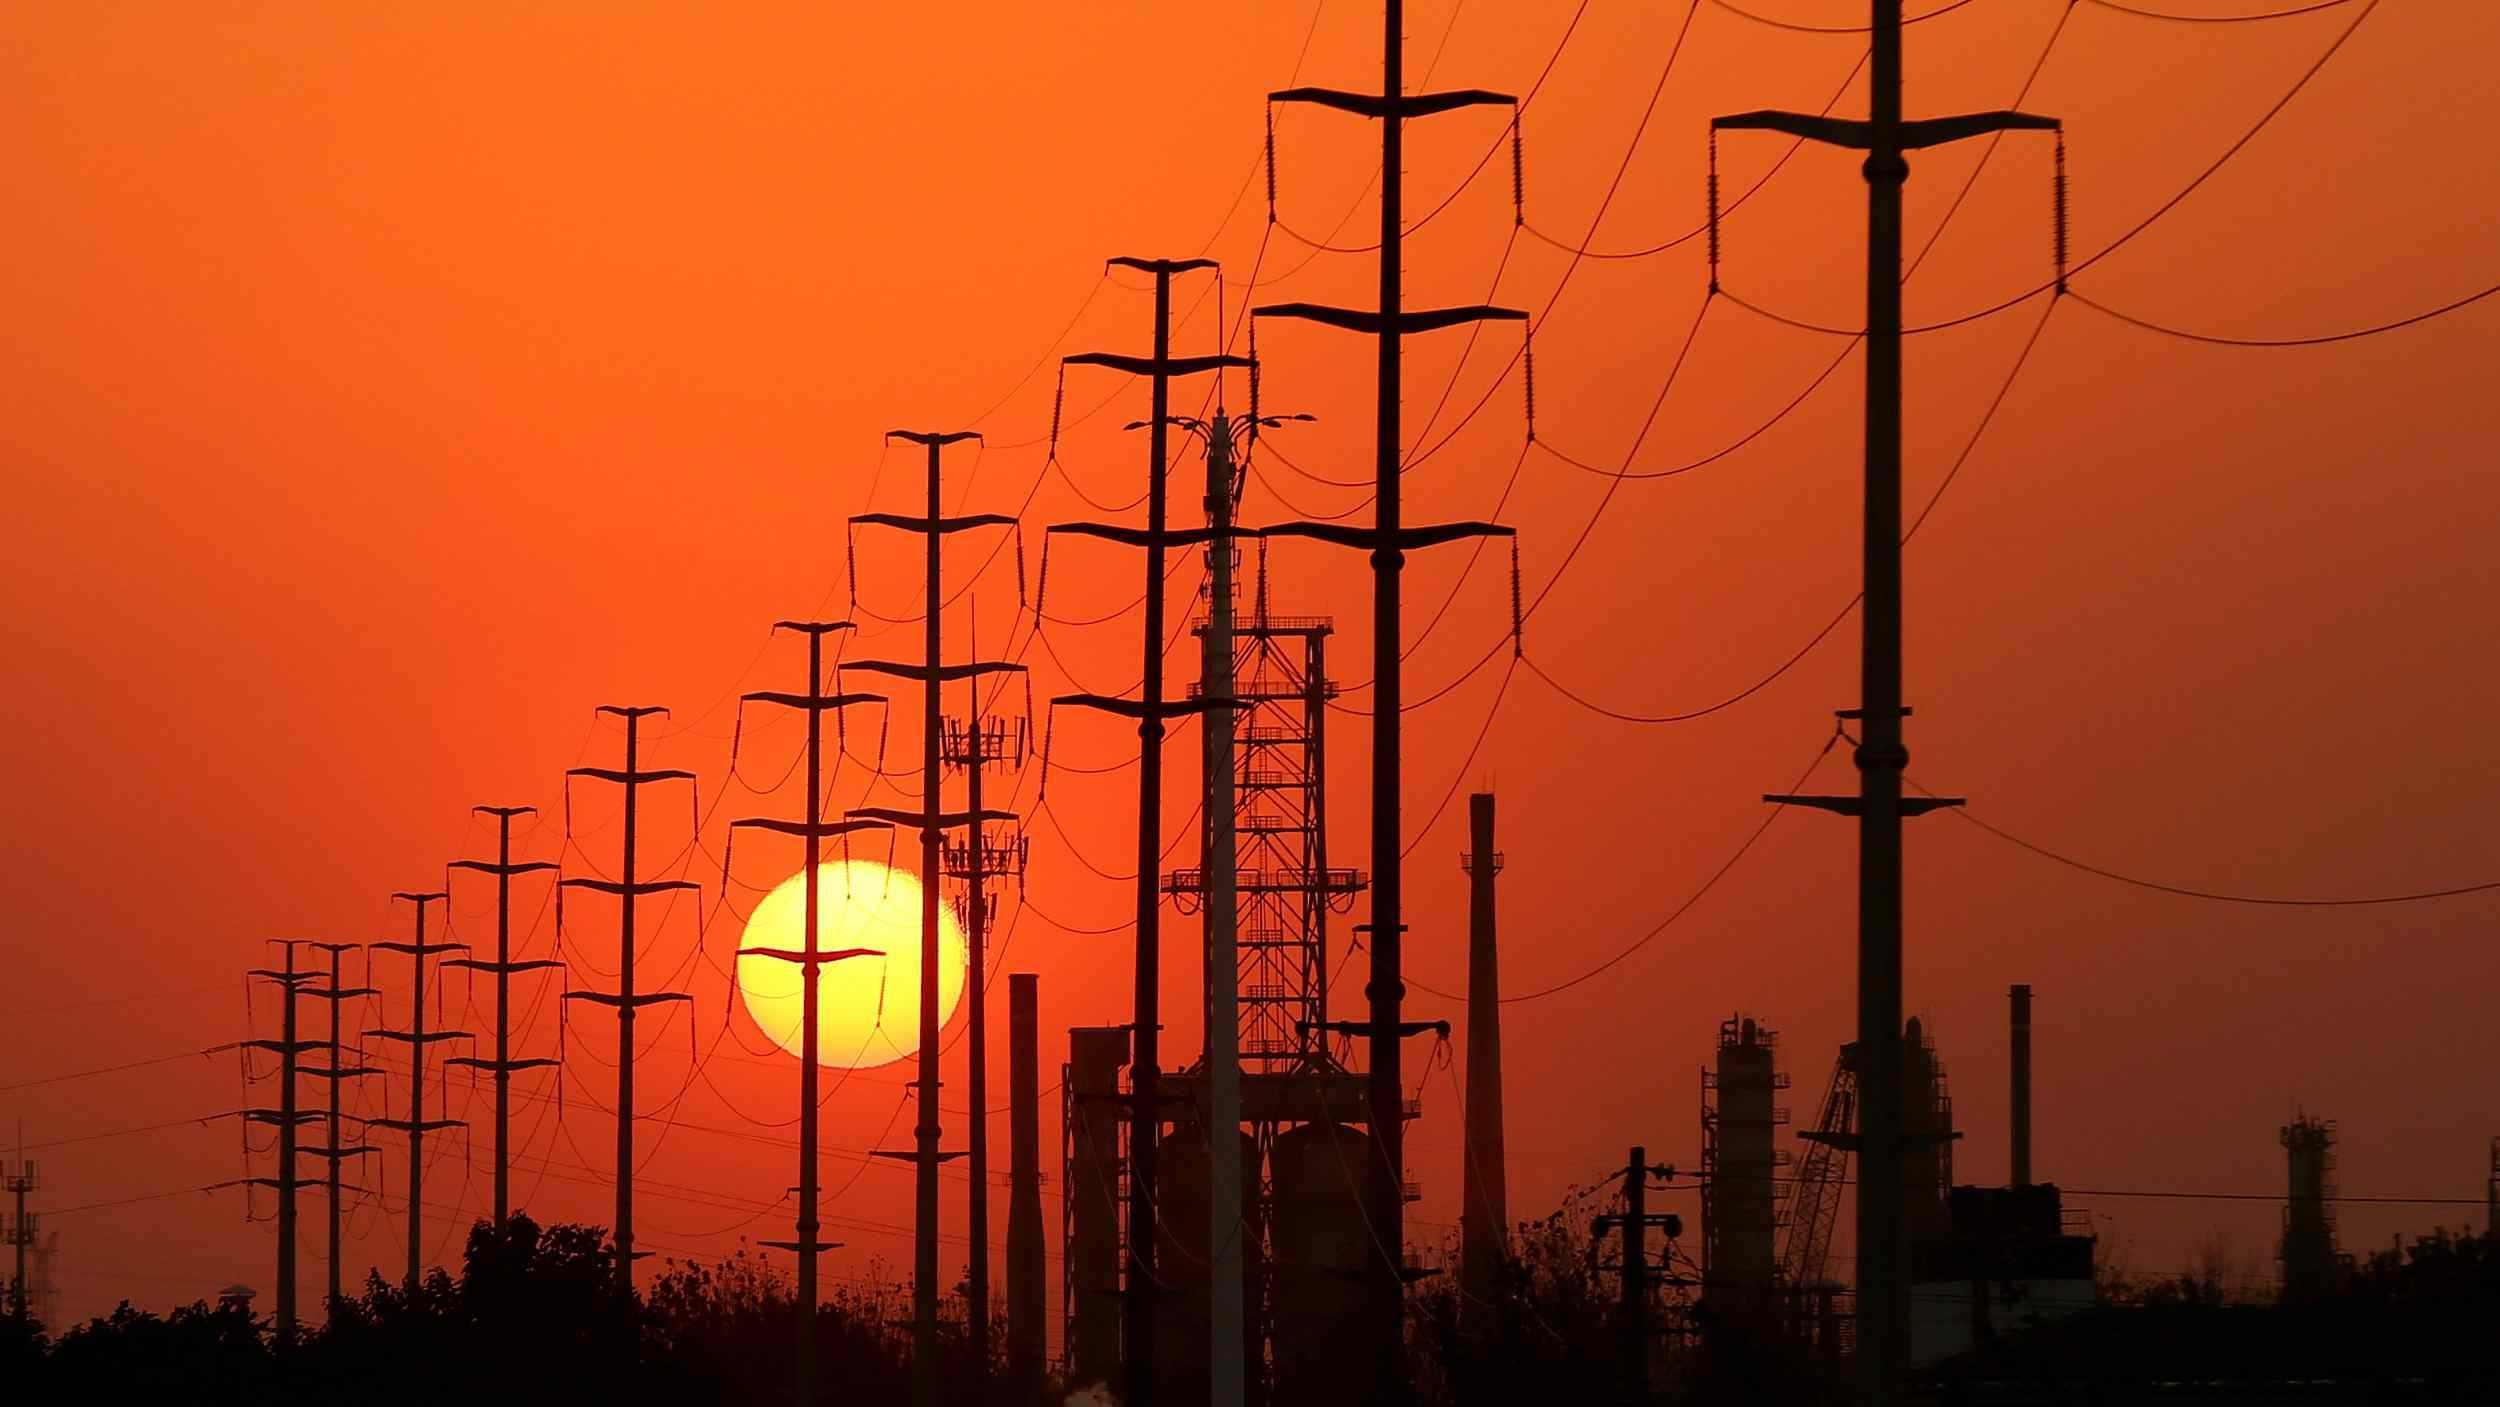 AU says over 600 mln Africans lack electricity despite huge renewable energy potential